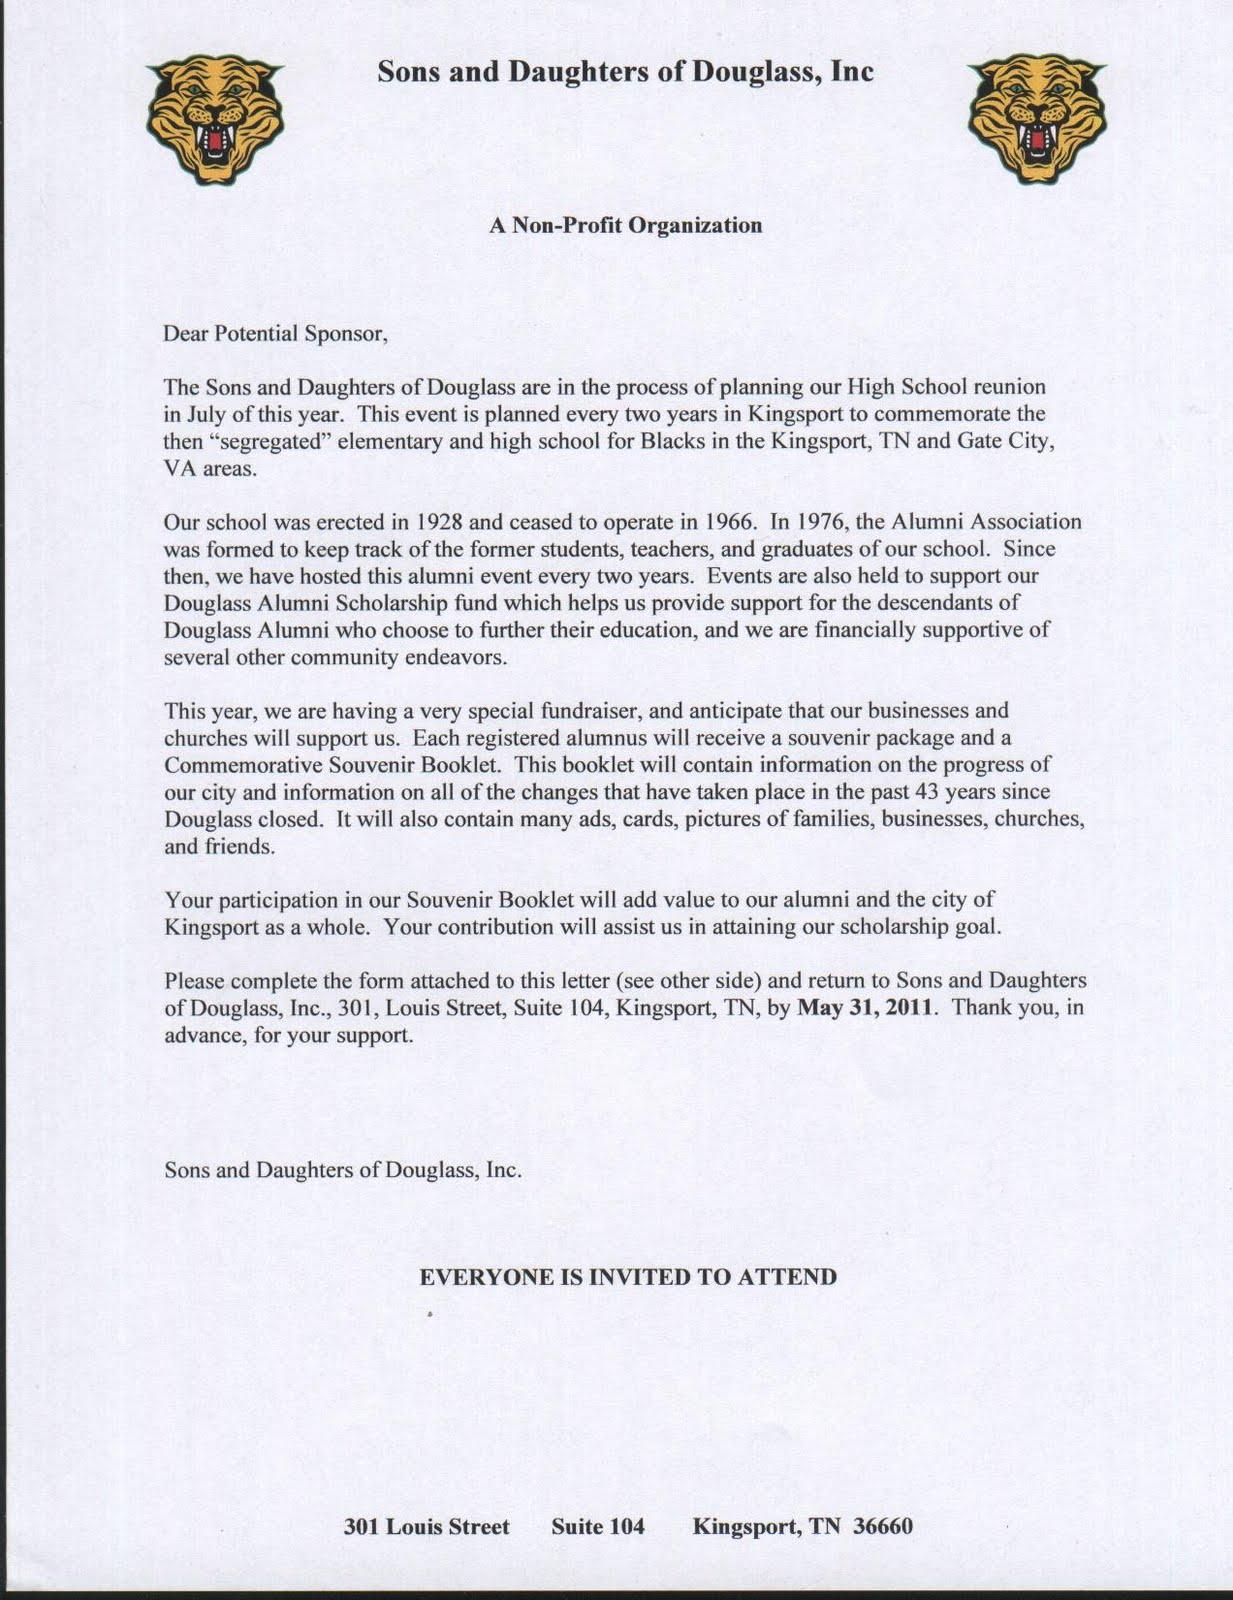 reunion invitation template – Sample Family Reunion Invitation Letter